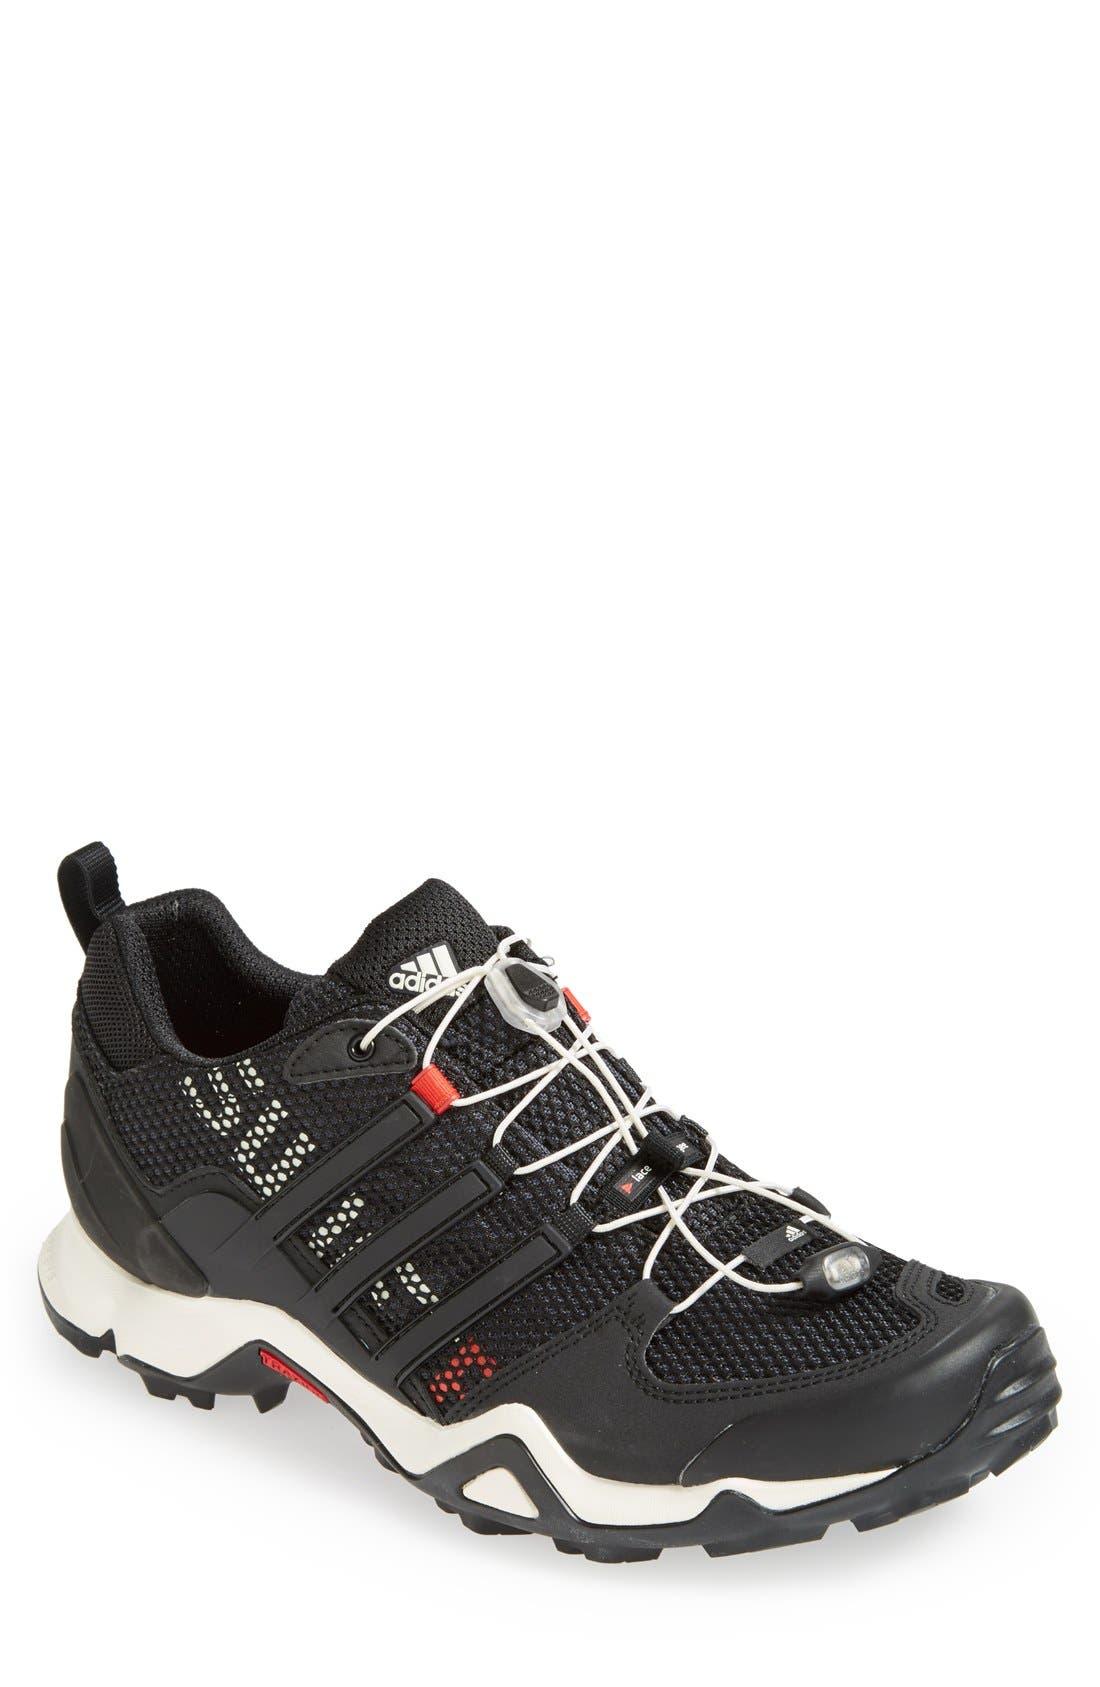 'Terrex Swift R' Hiking Shoe, Main, color, 001